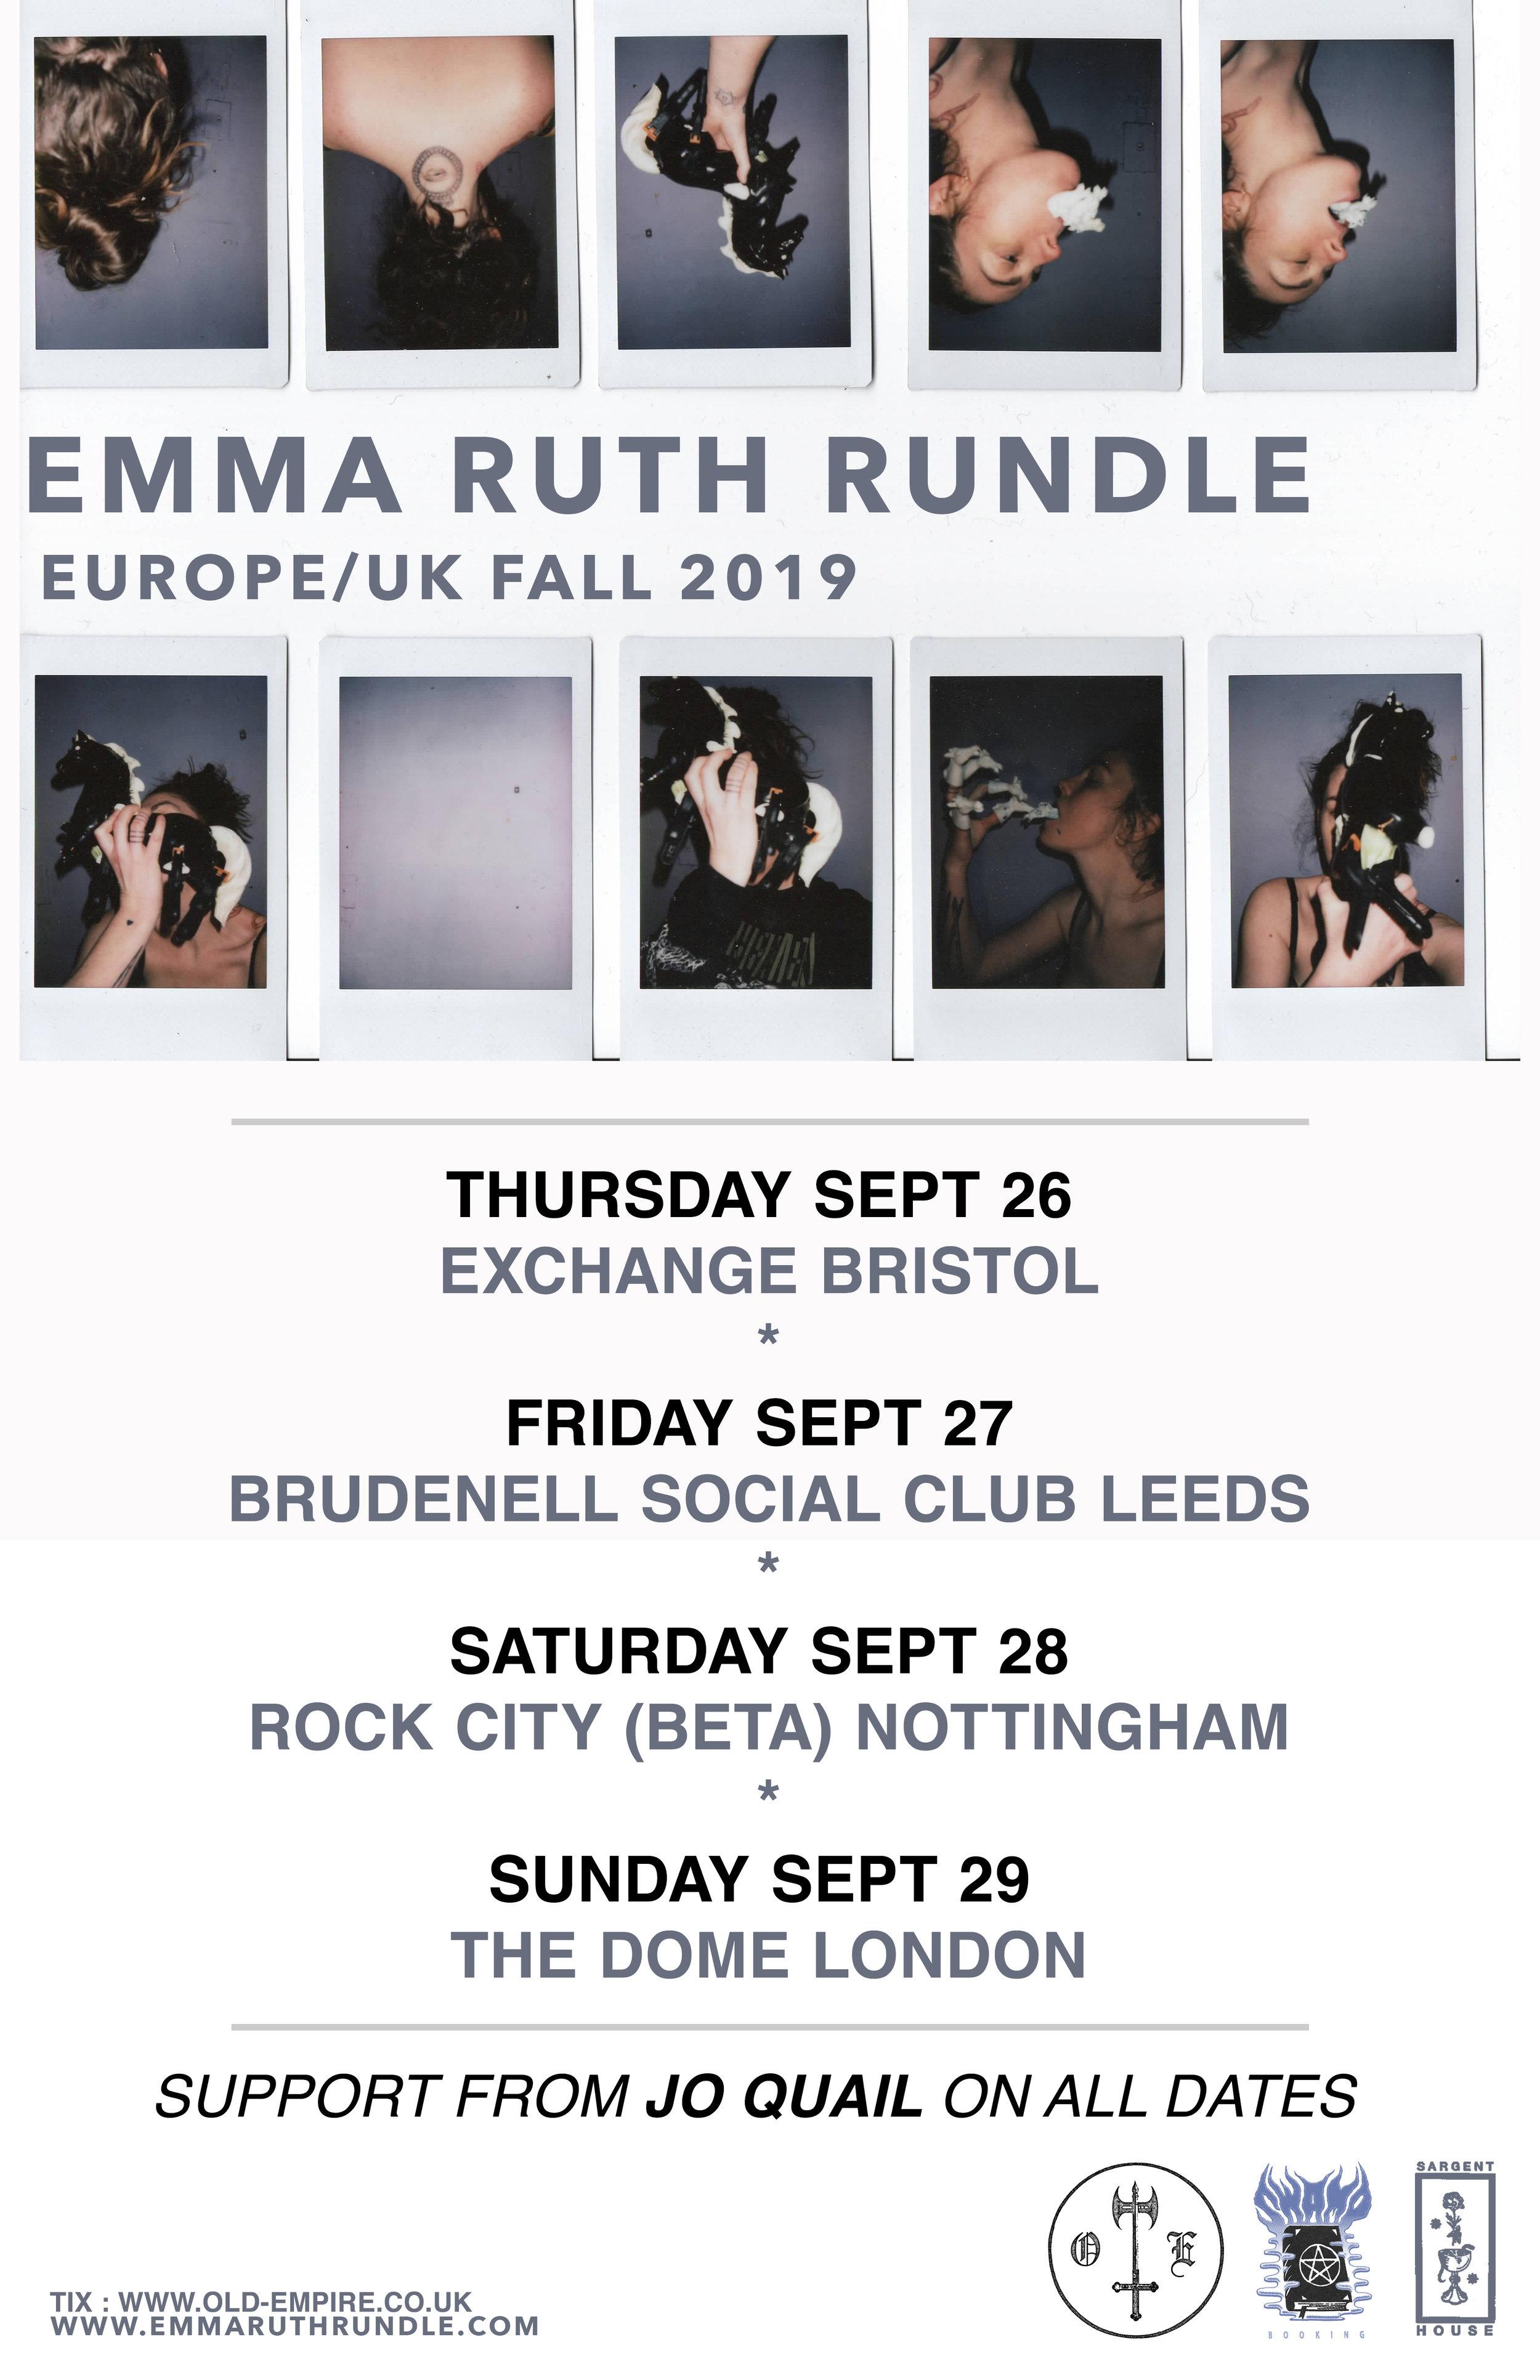 Emma_ruth_rundle_Dome_london_2019.jpg